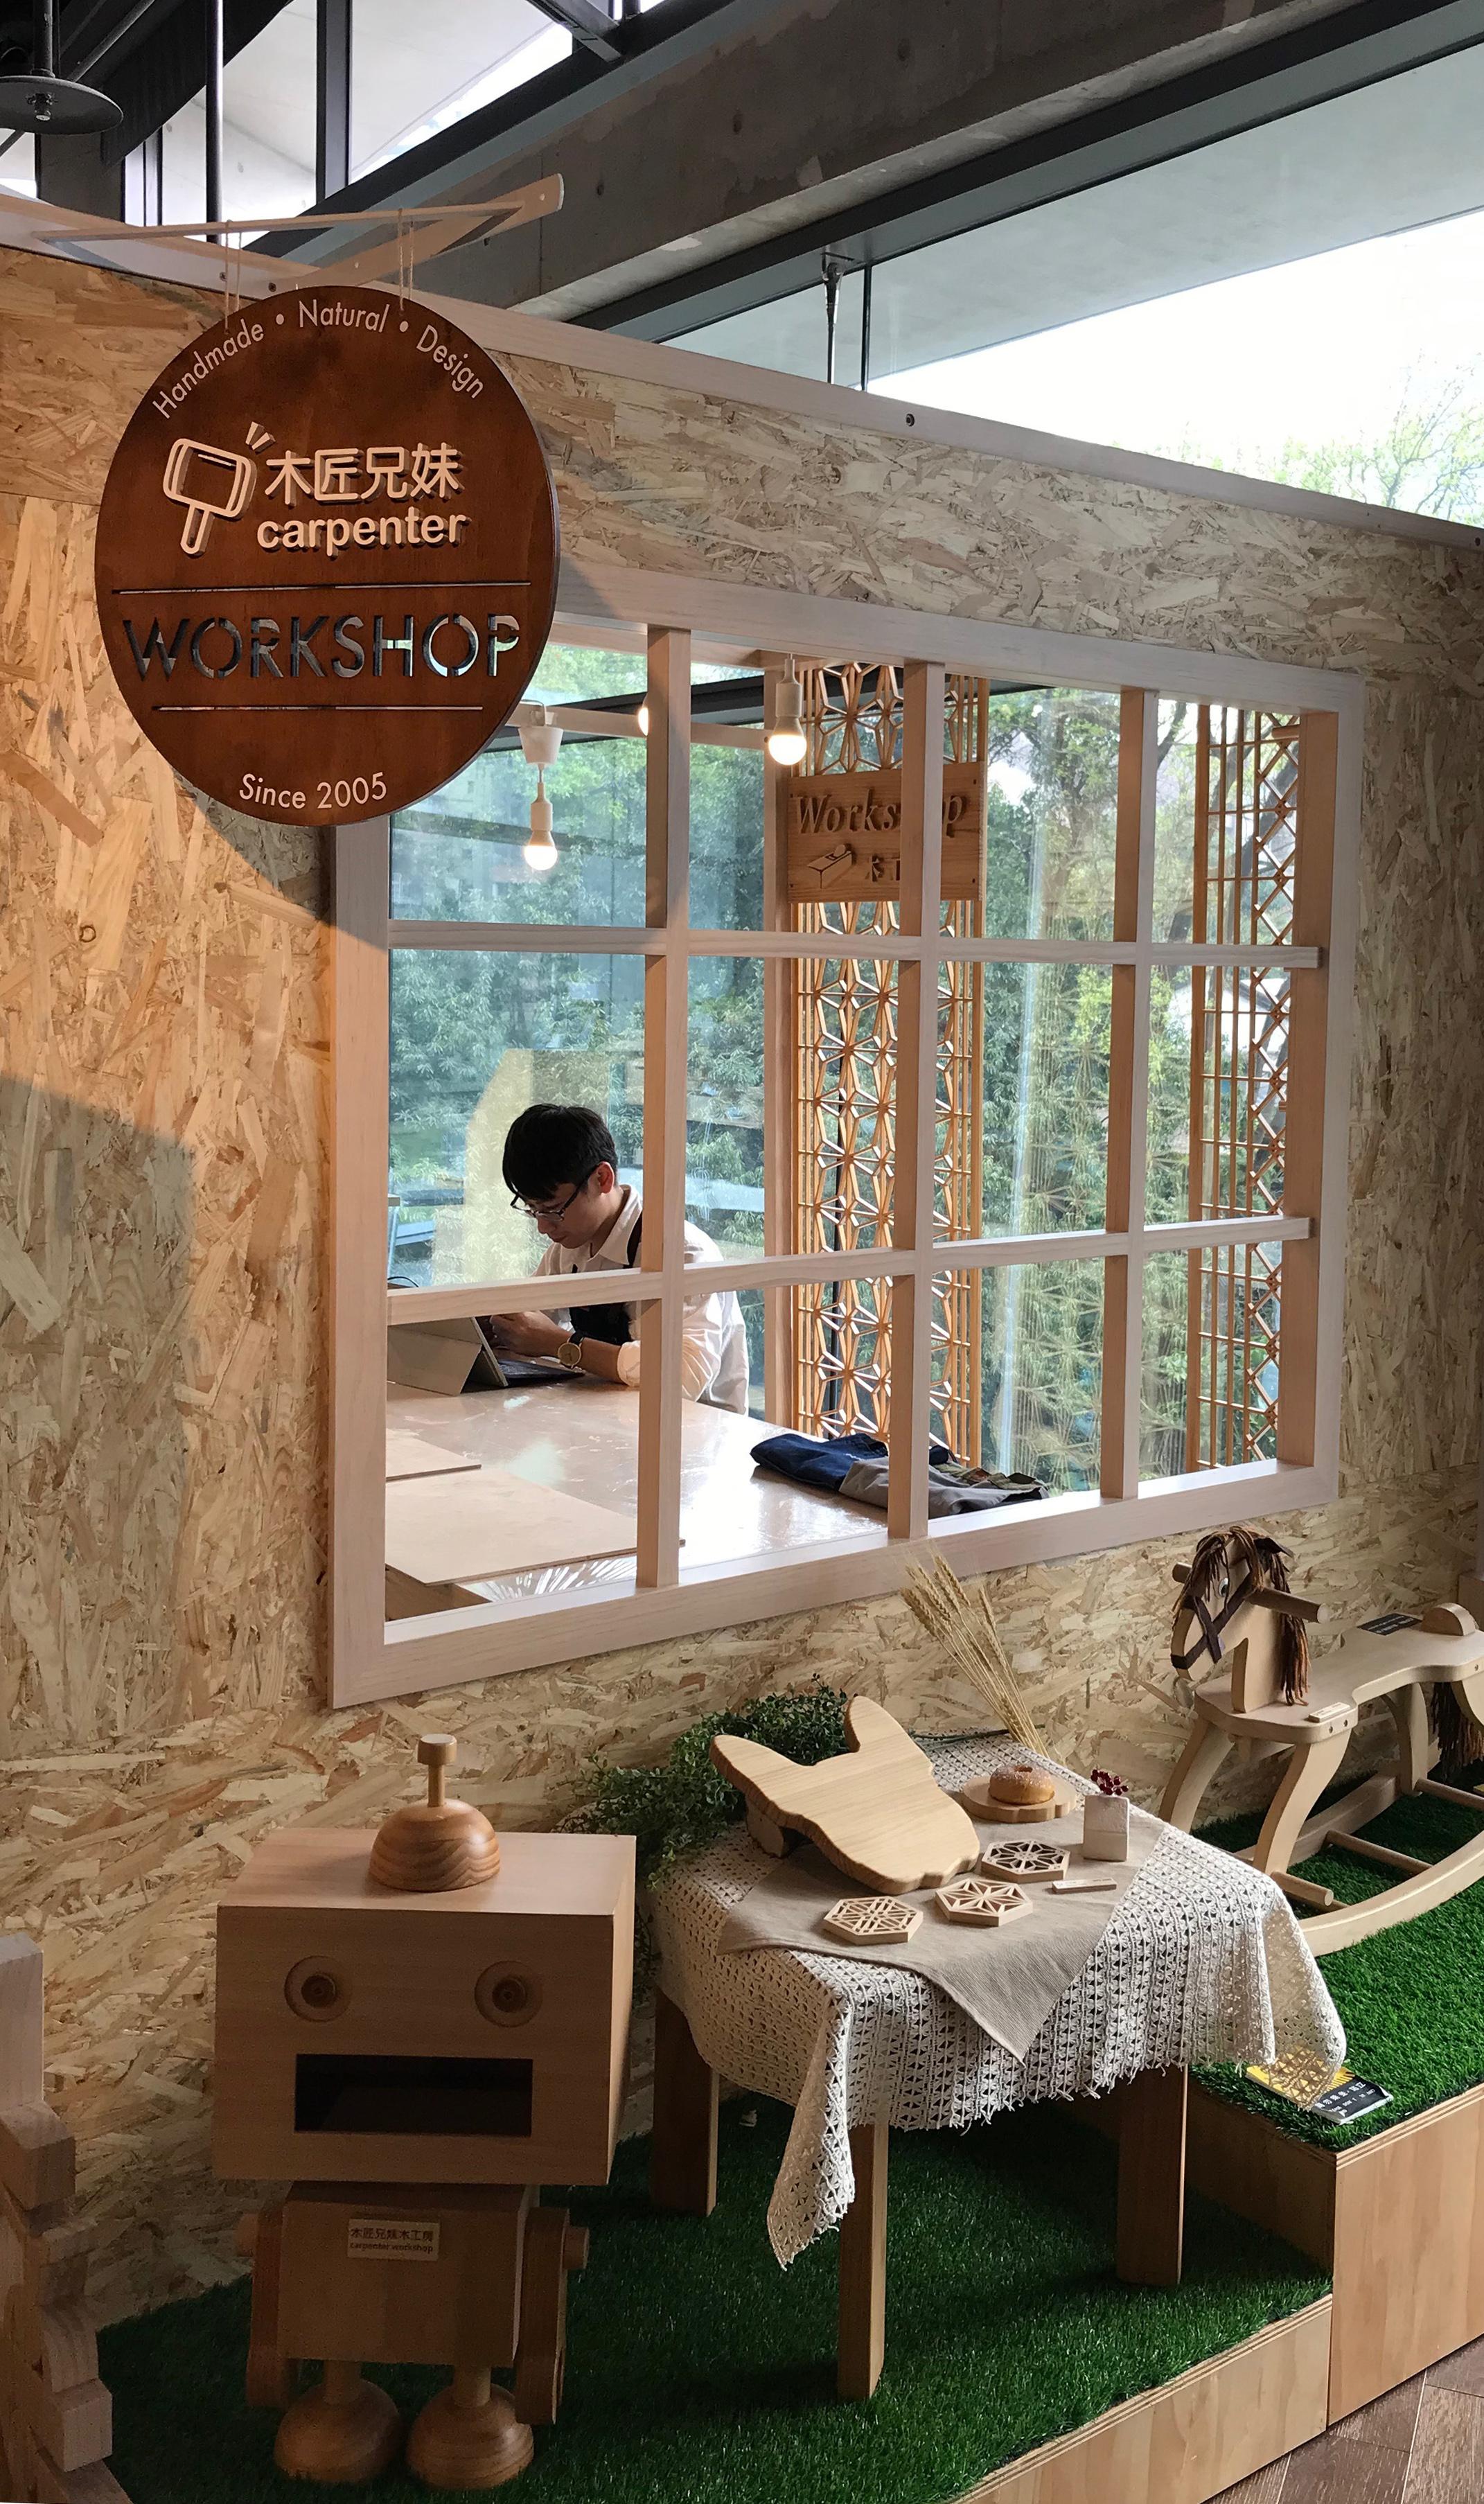 carpenter taiwan.jpg